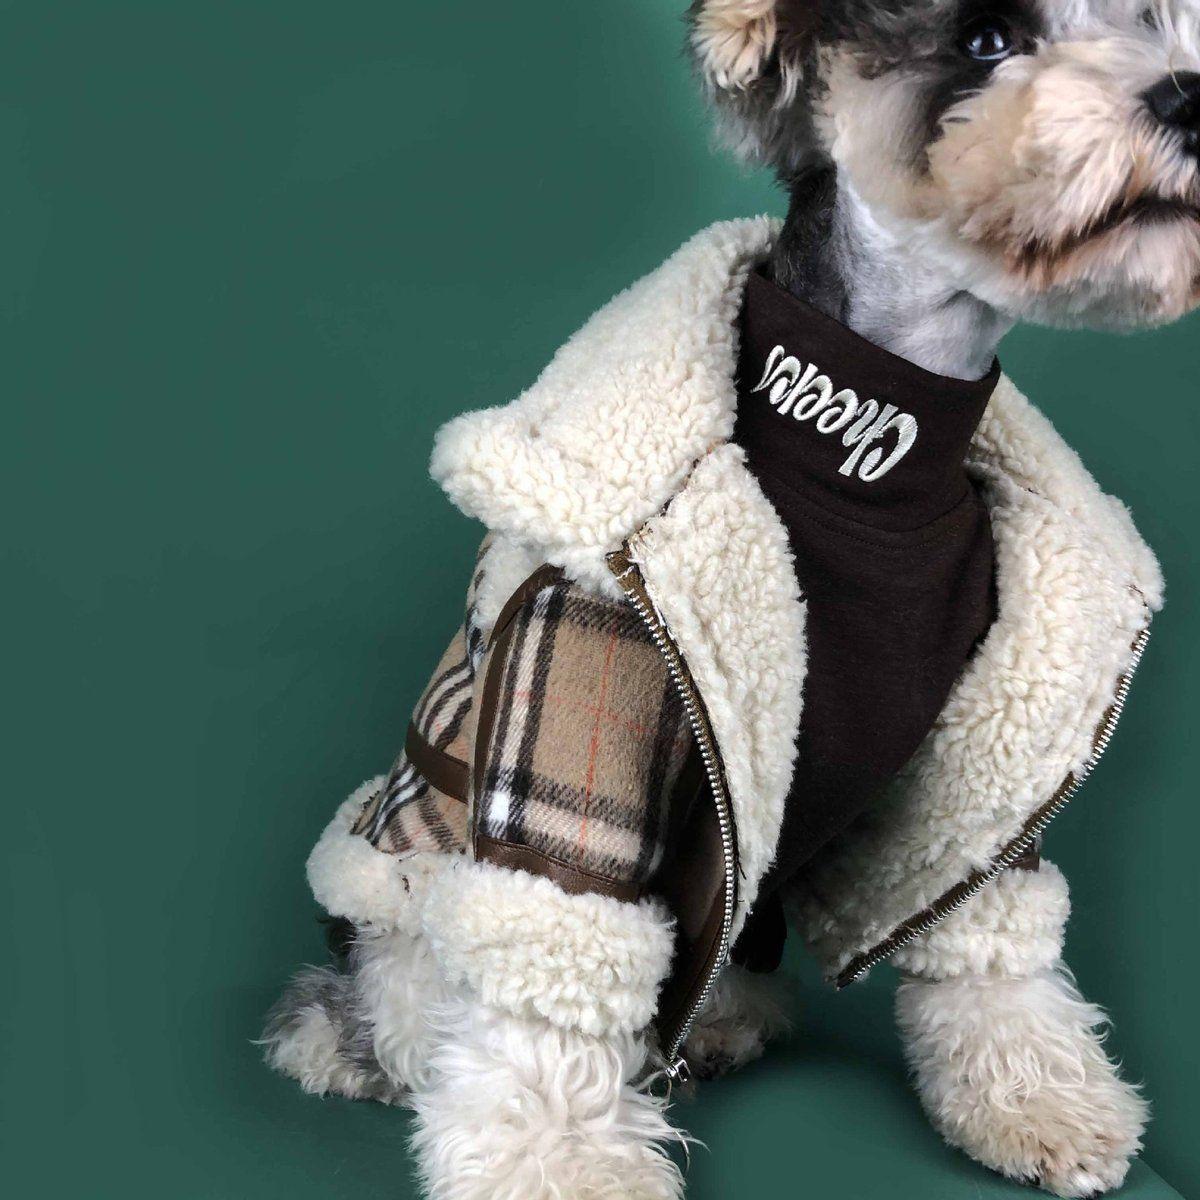 Buberry Dog Advanced Jacket Super Warm W100 Dog Coats Pet Costumes Dog Winter Coat